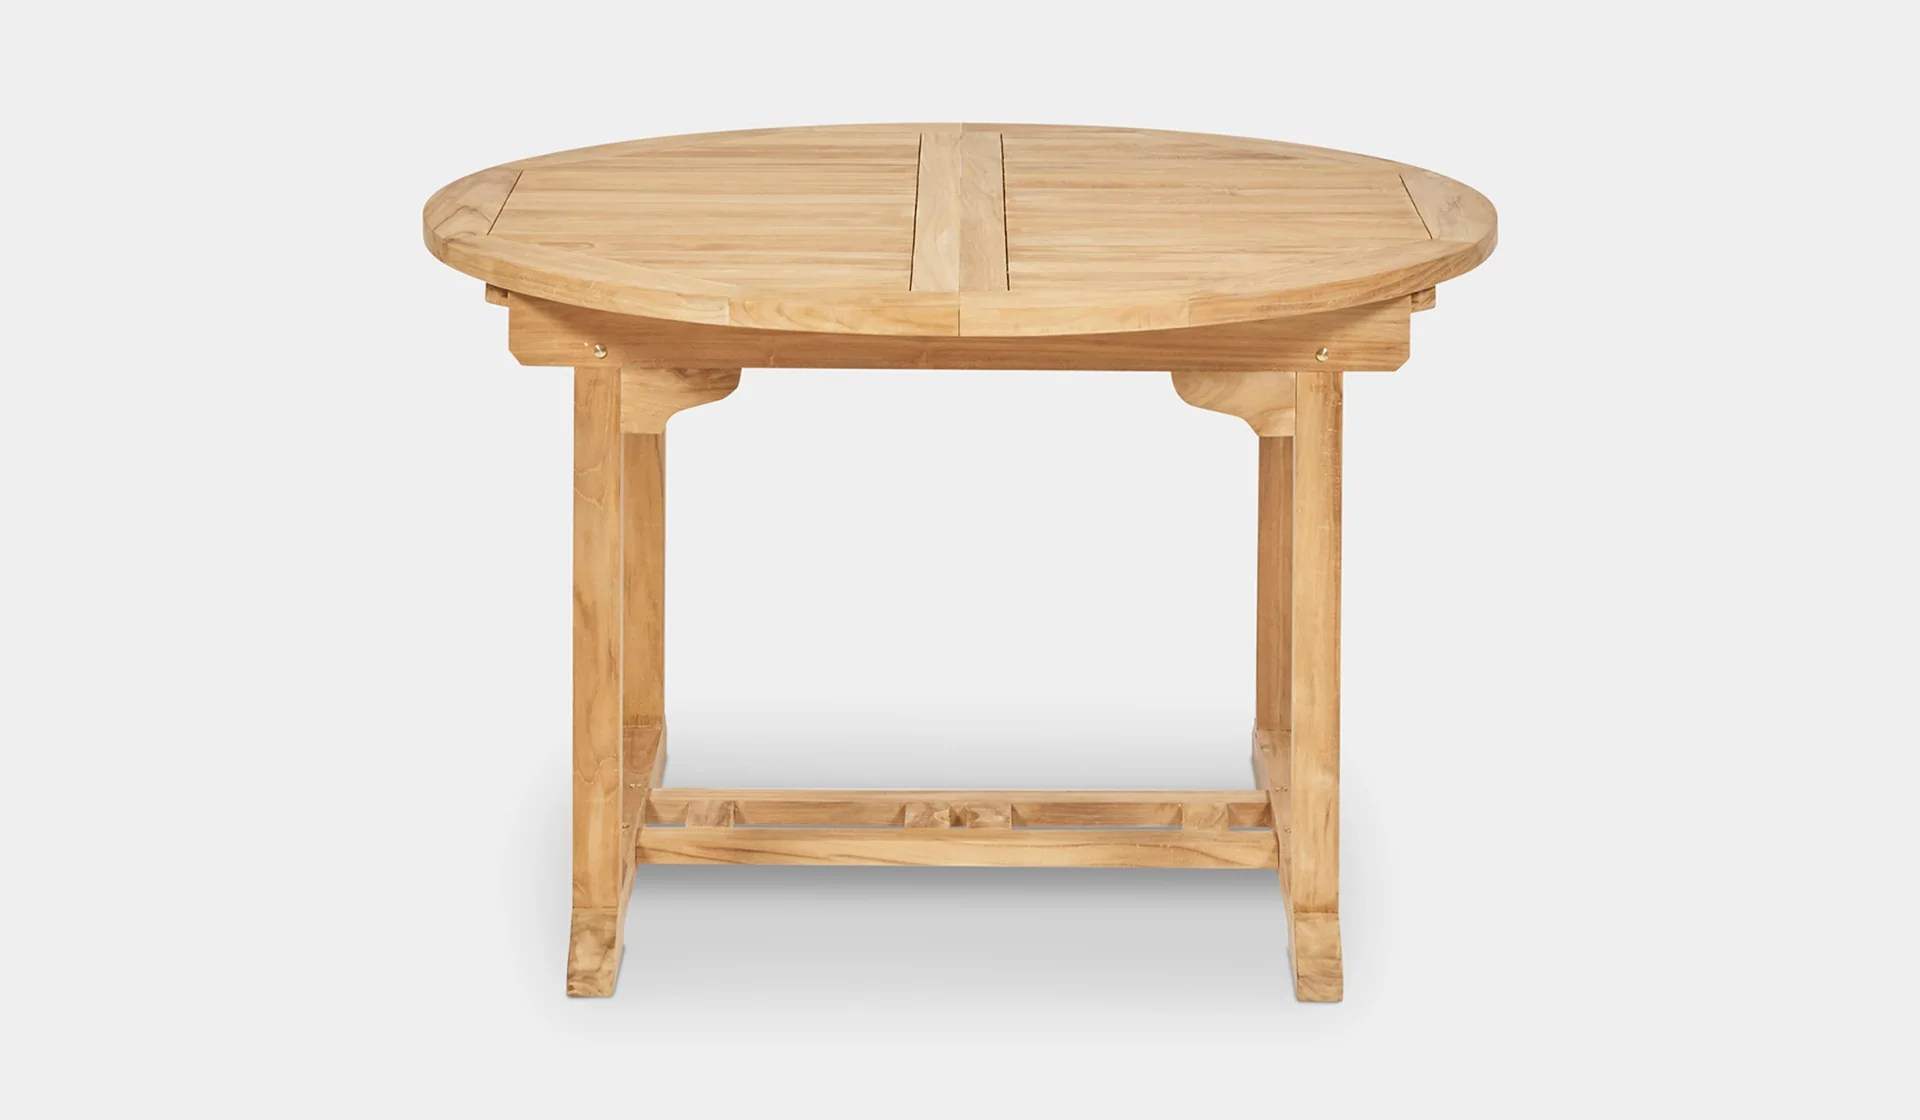 Teak Round Extending Table 120 180cm Woodbury Furniture